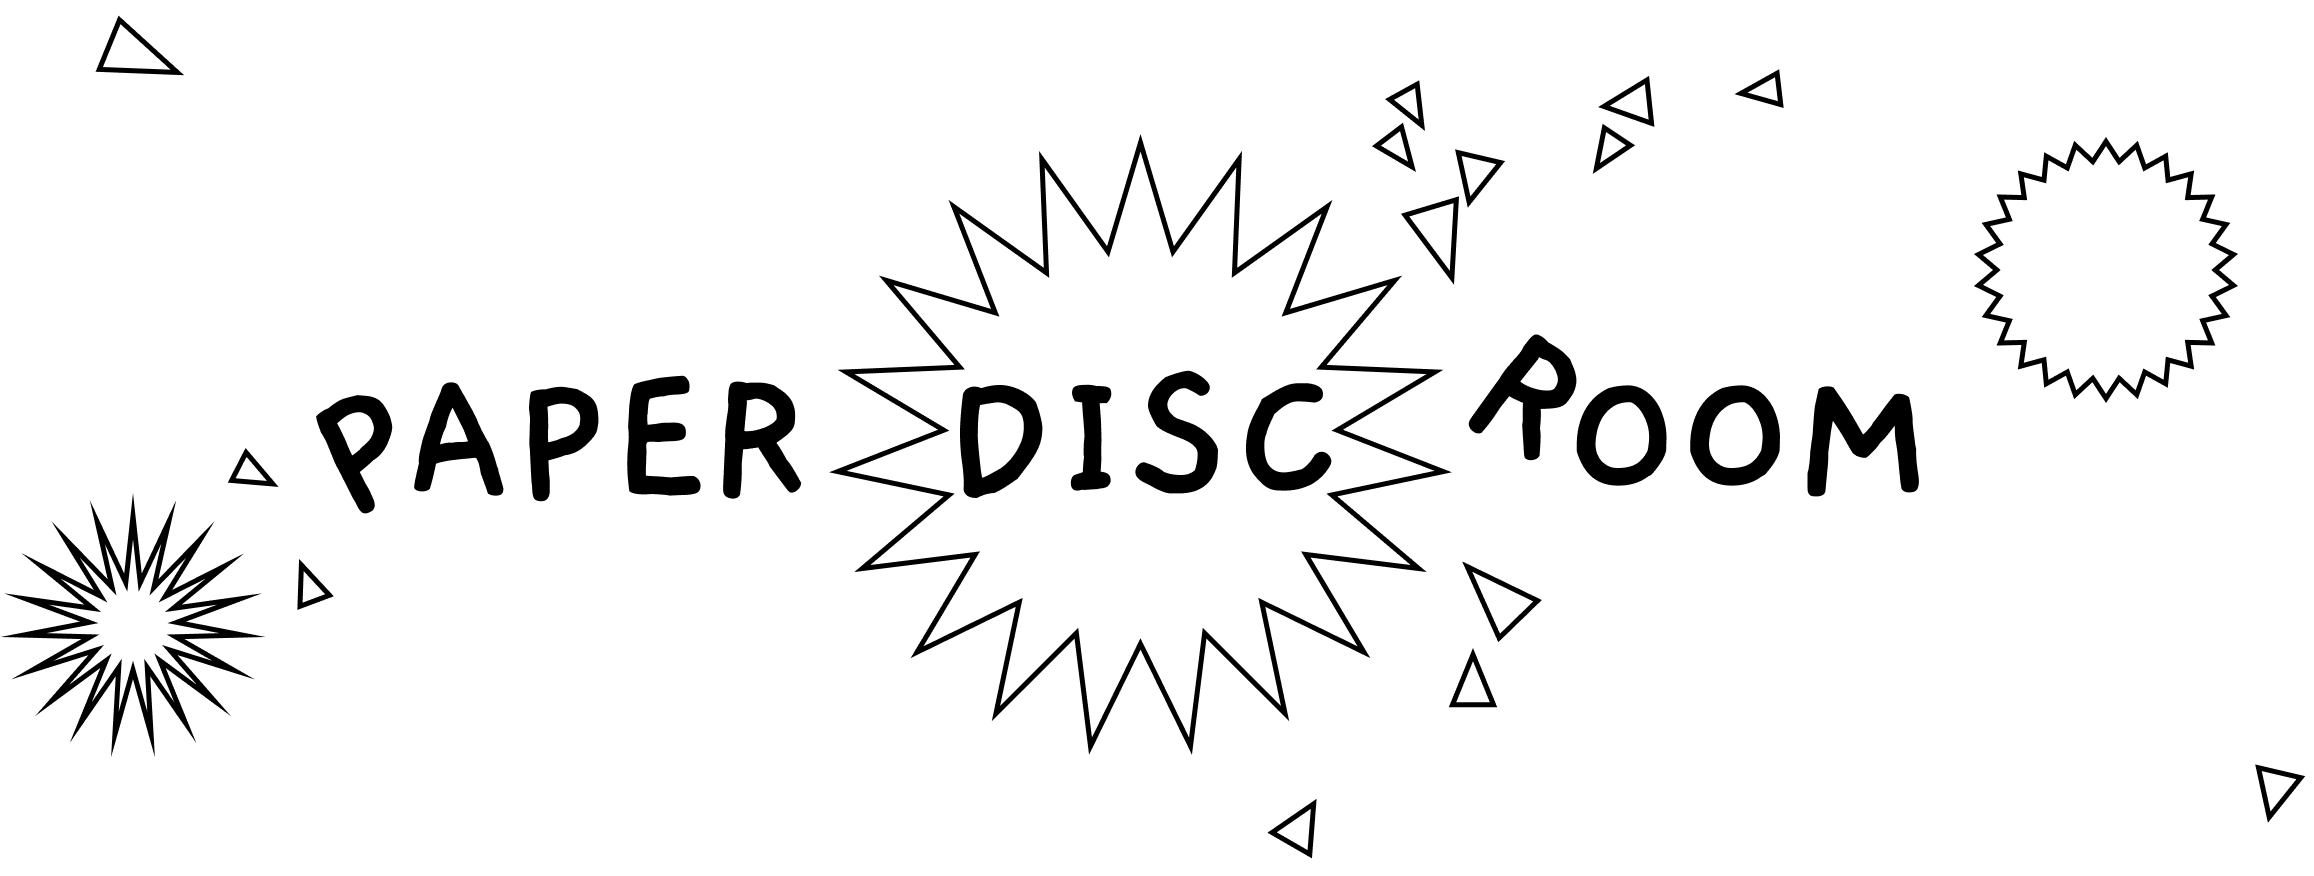 Paper Disc Room